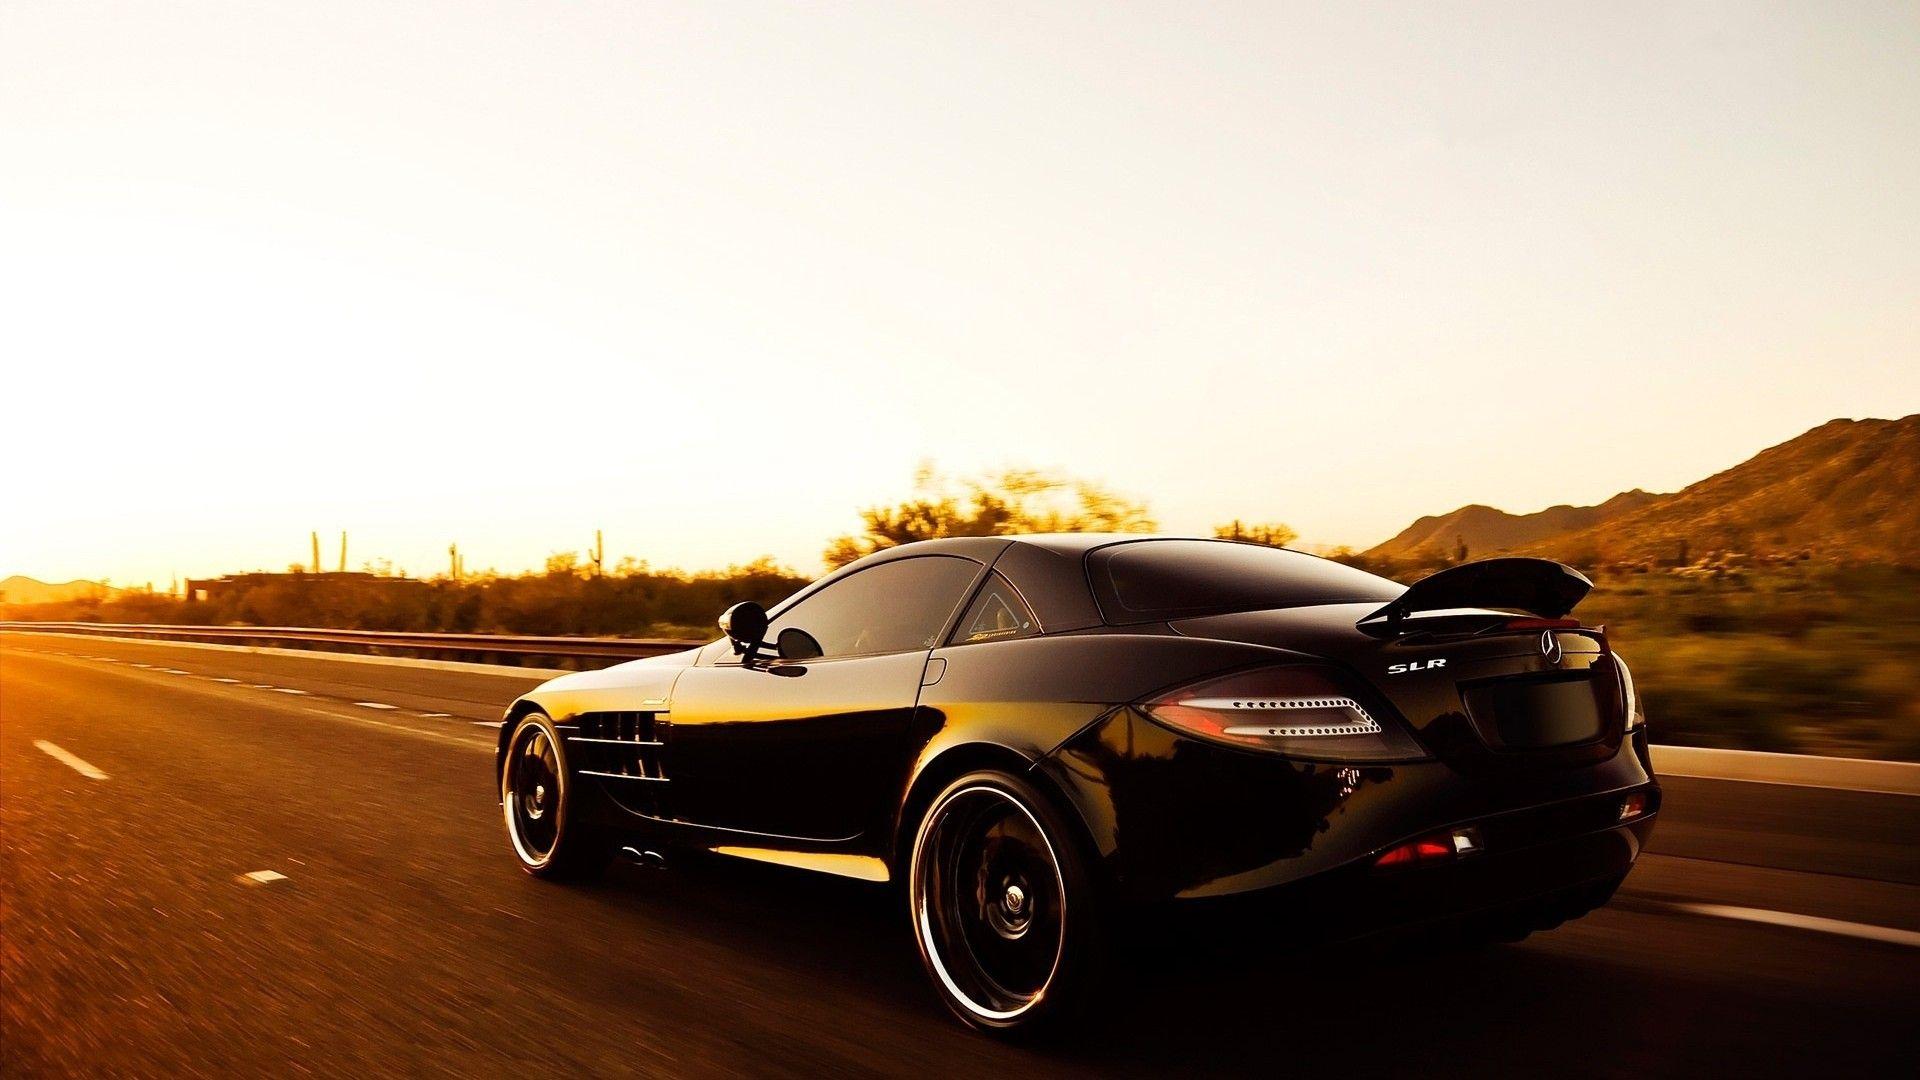 Download Black Mercedes Benz Slr Mclaren 722 Car Wallpaper Free By Warnerboutique Com Mercedes Slr Voiture Mercedes Voitures De Luxe